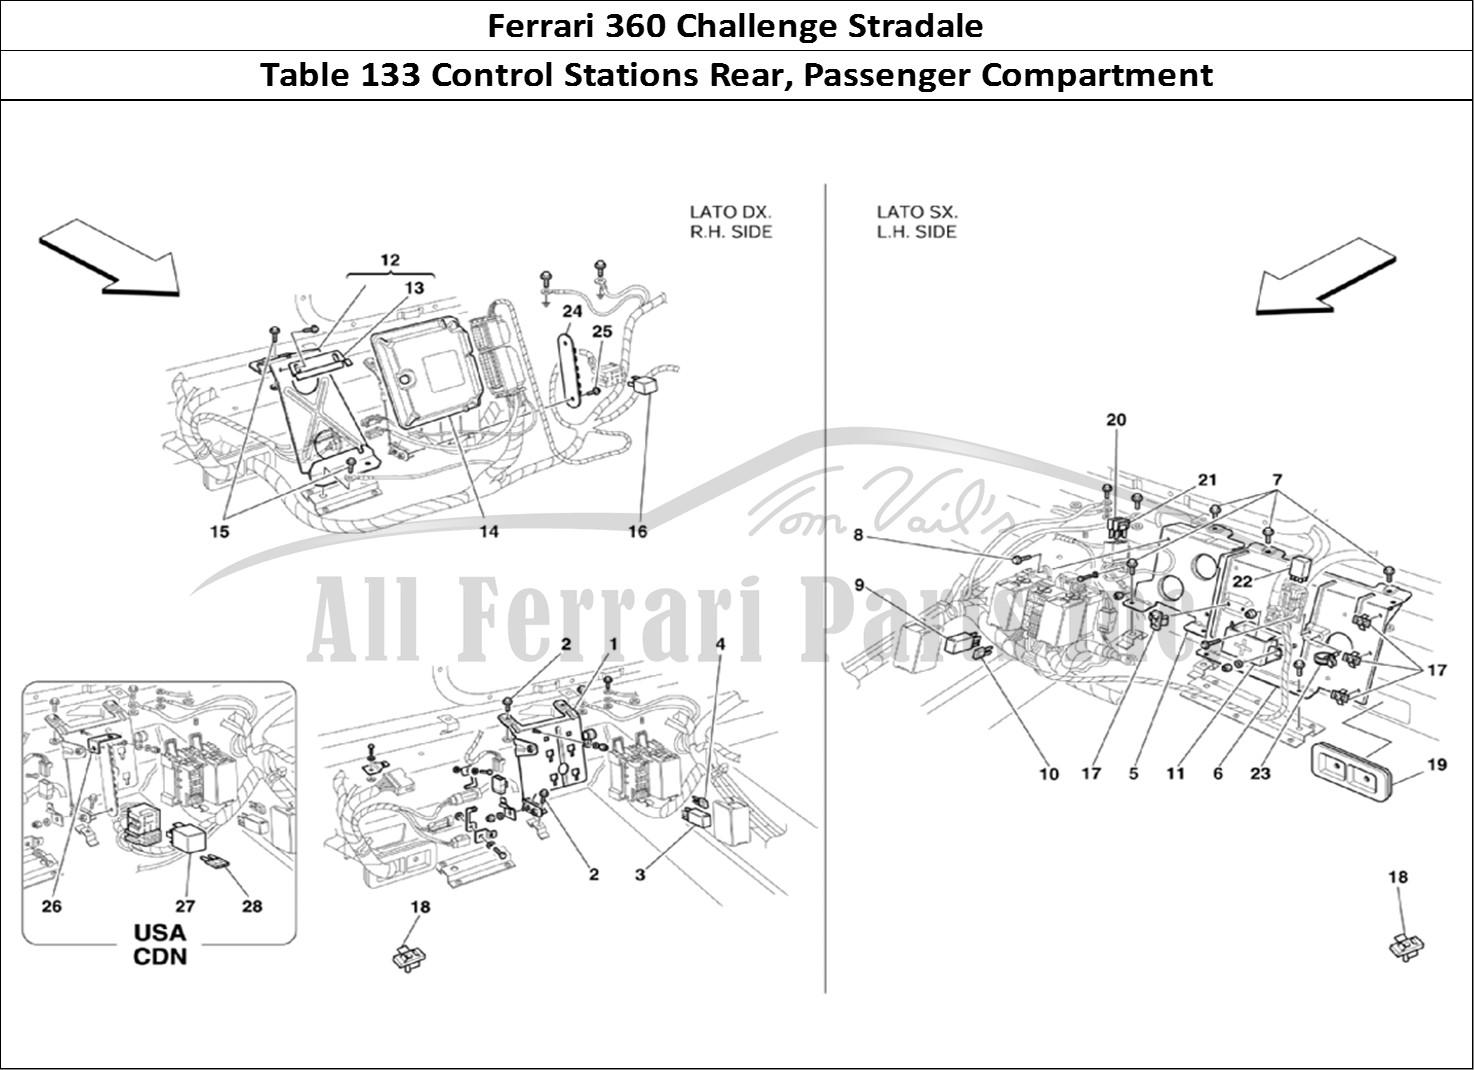 Buy original Ferrari 360 Challenge Stradale 133 Control